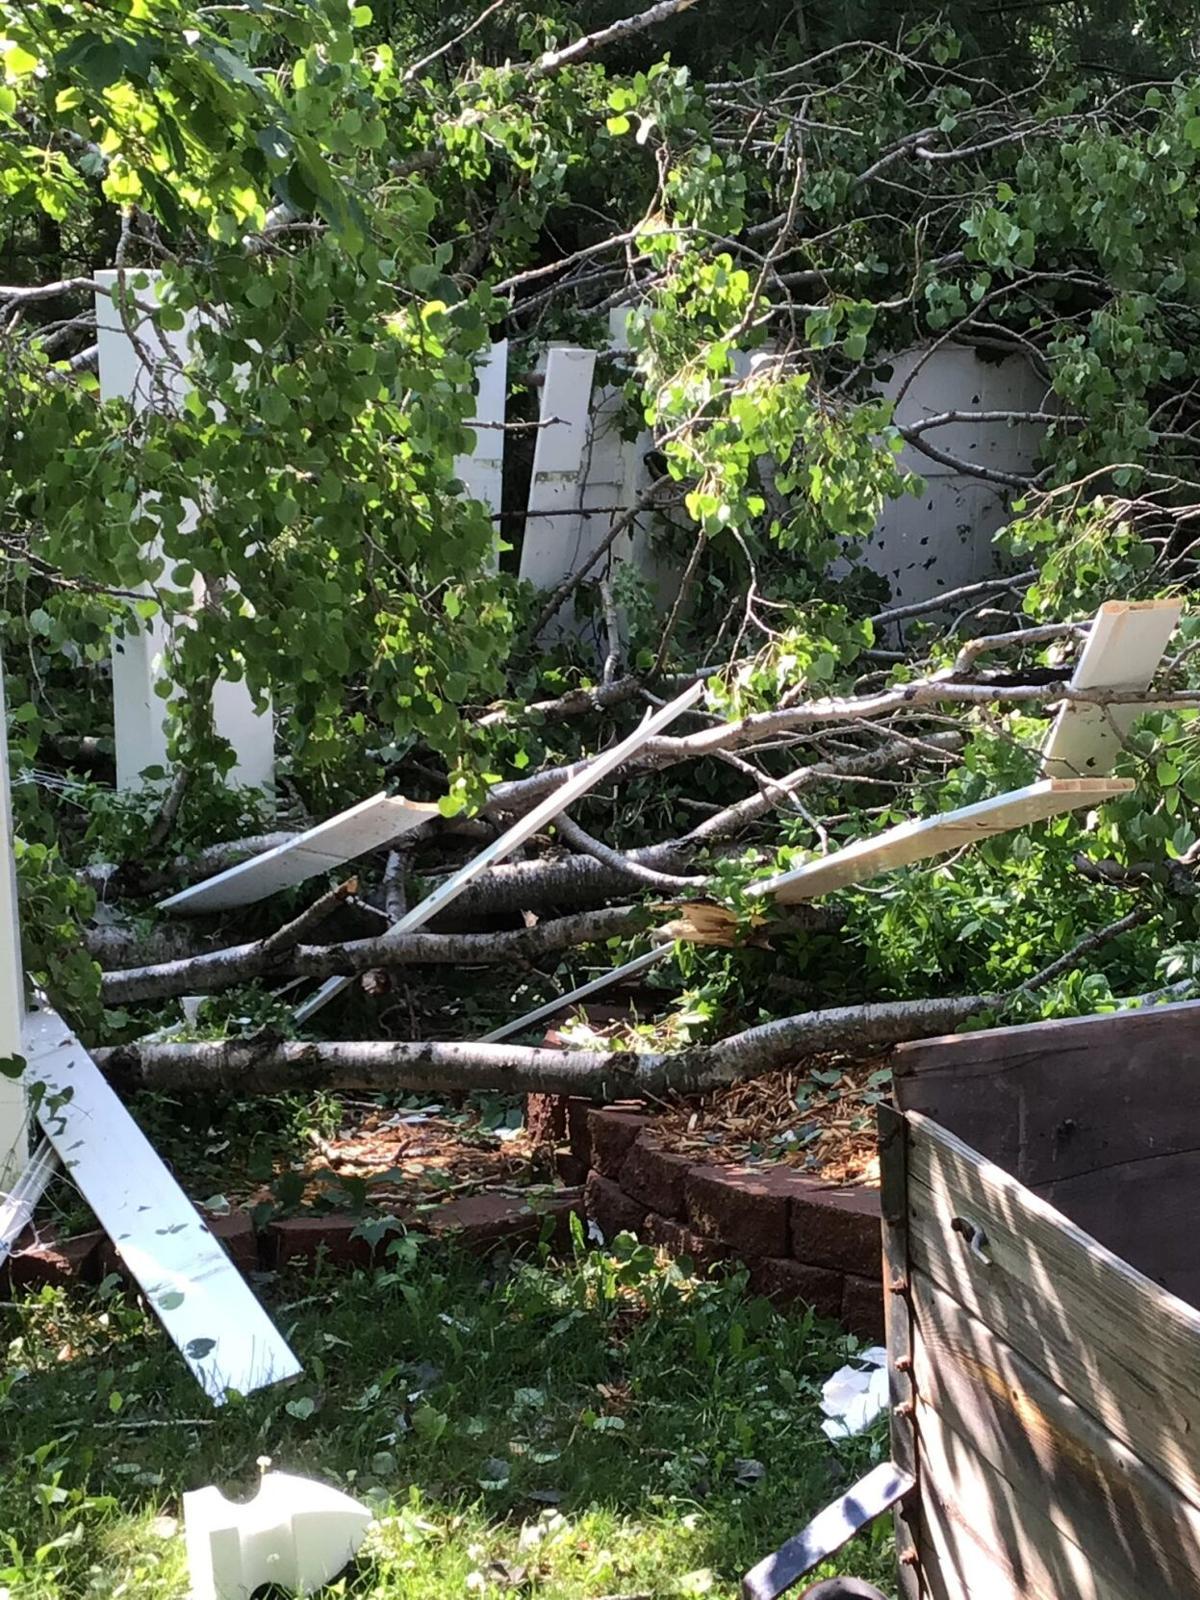 NWS tornado damage Roscommon vertical